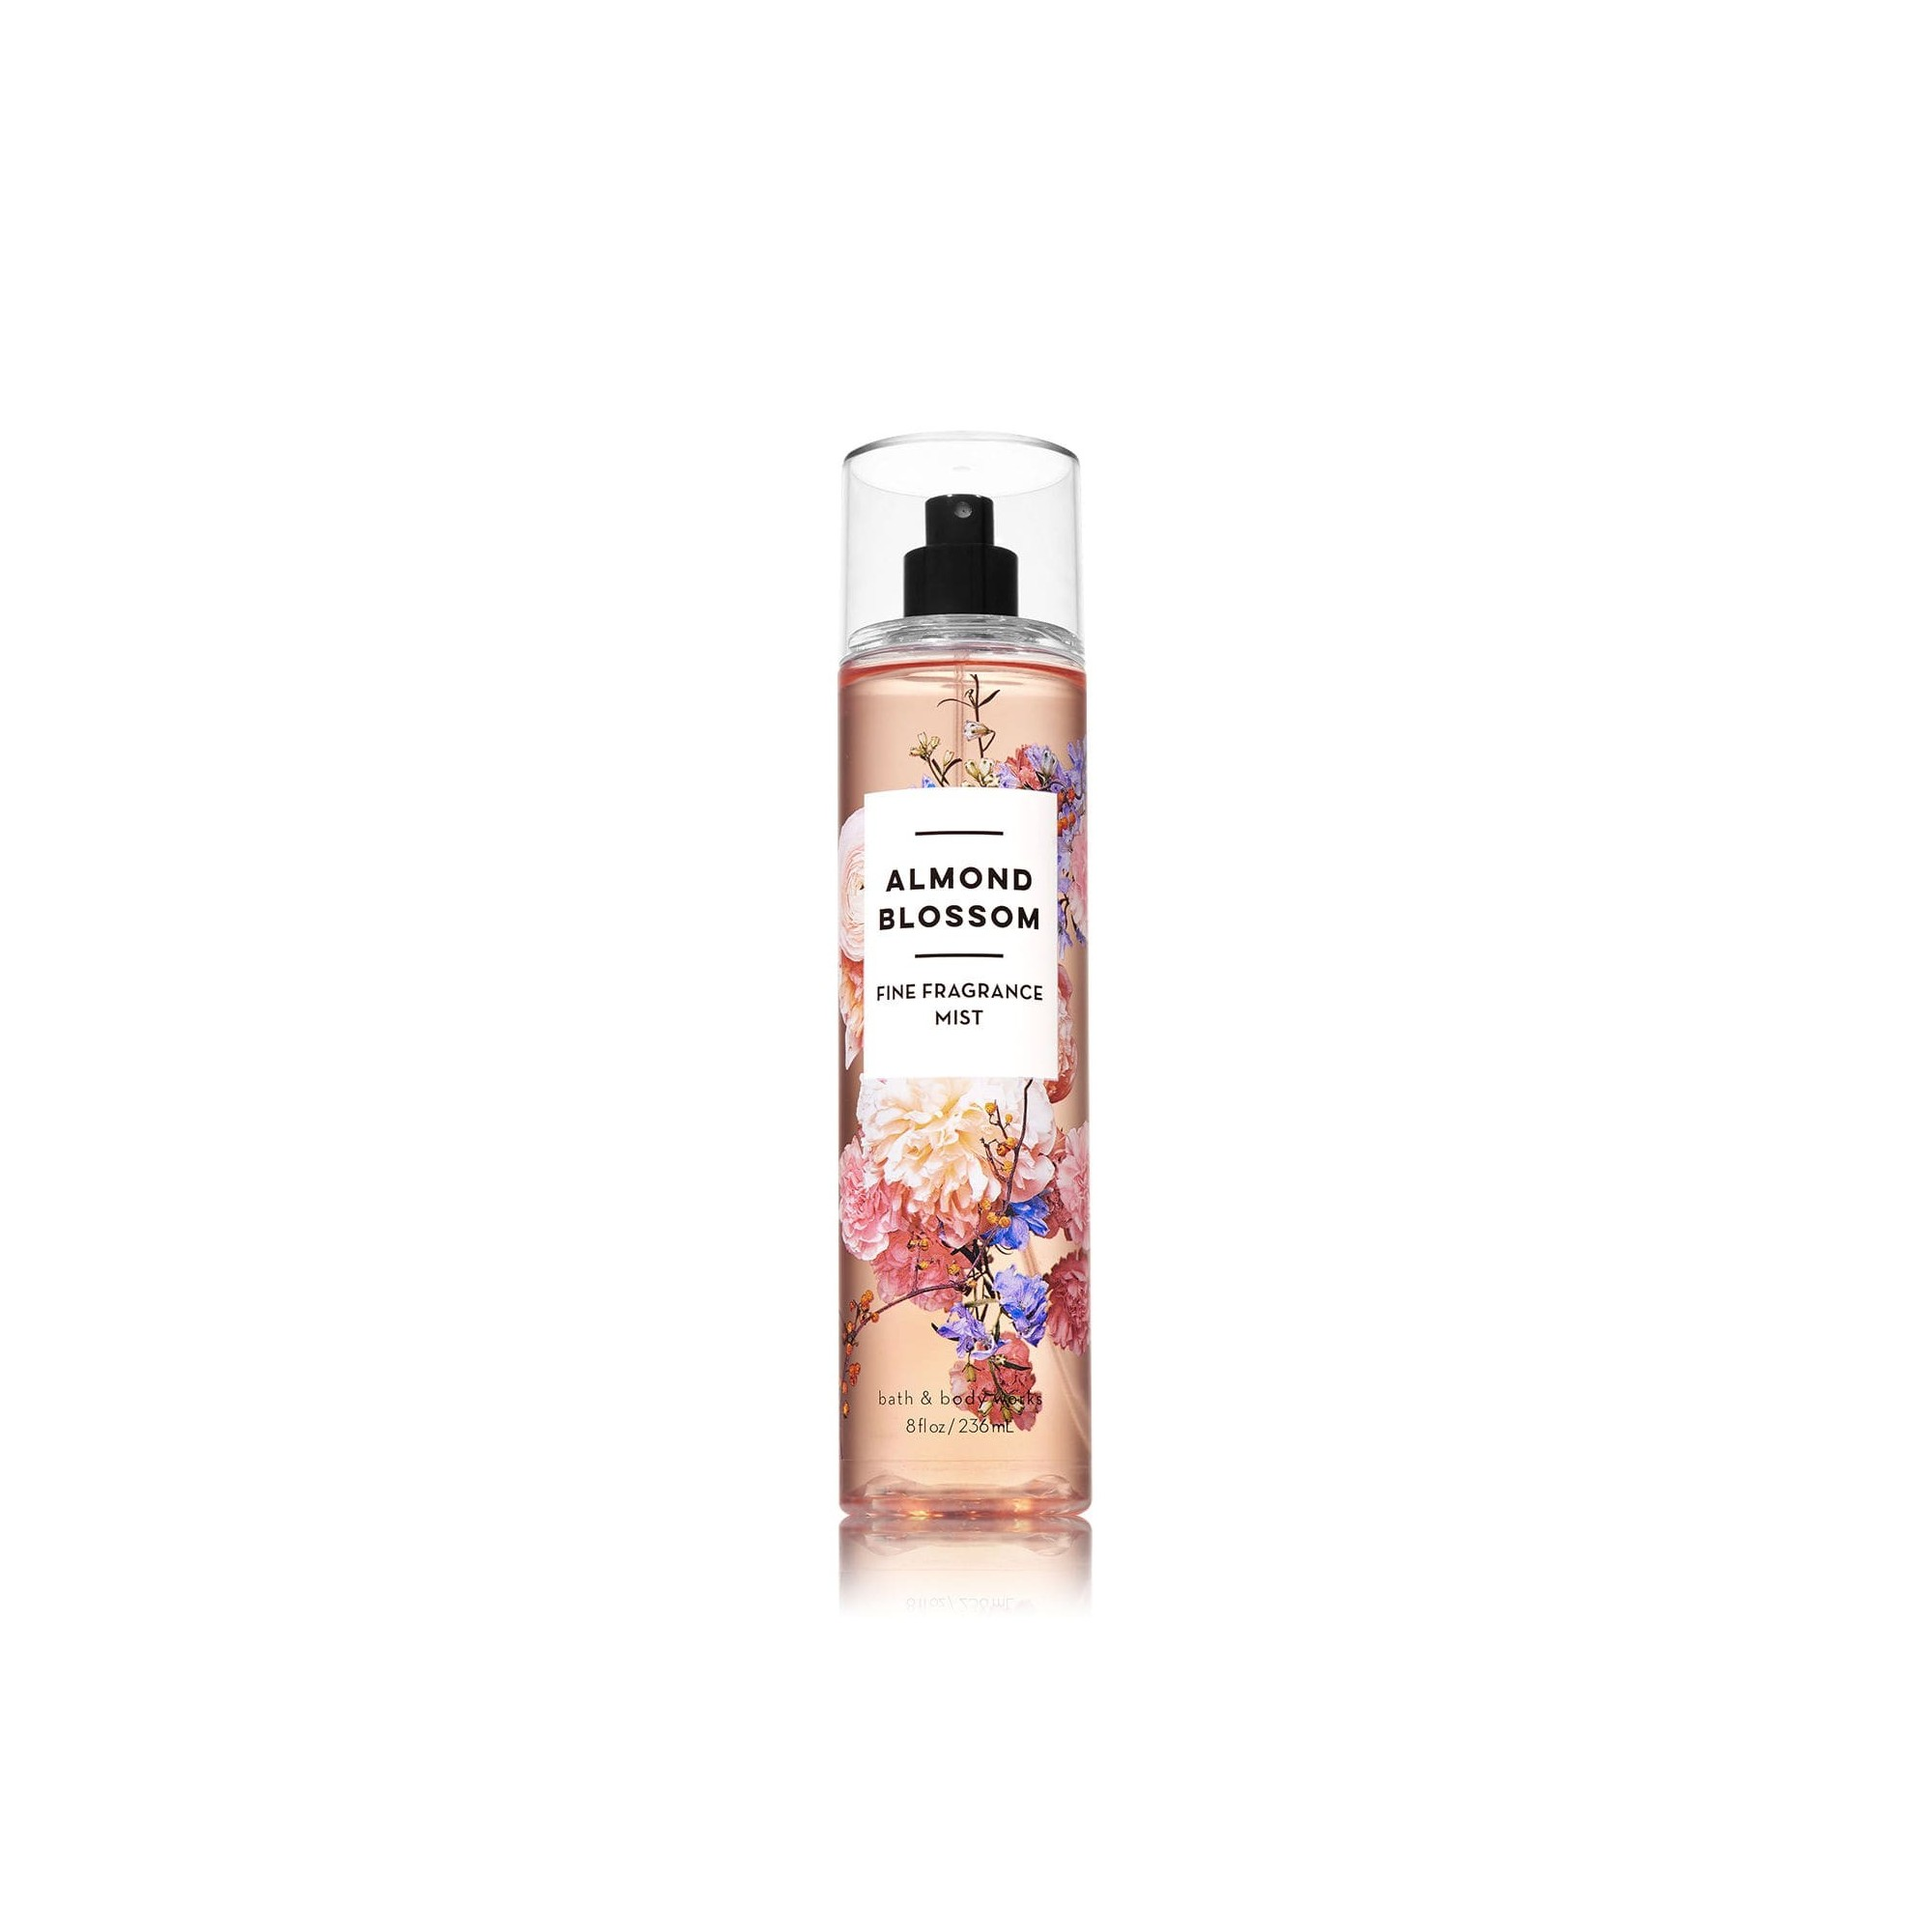 Bath & Body Works Almond Blossom Fine Fragrance Mist